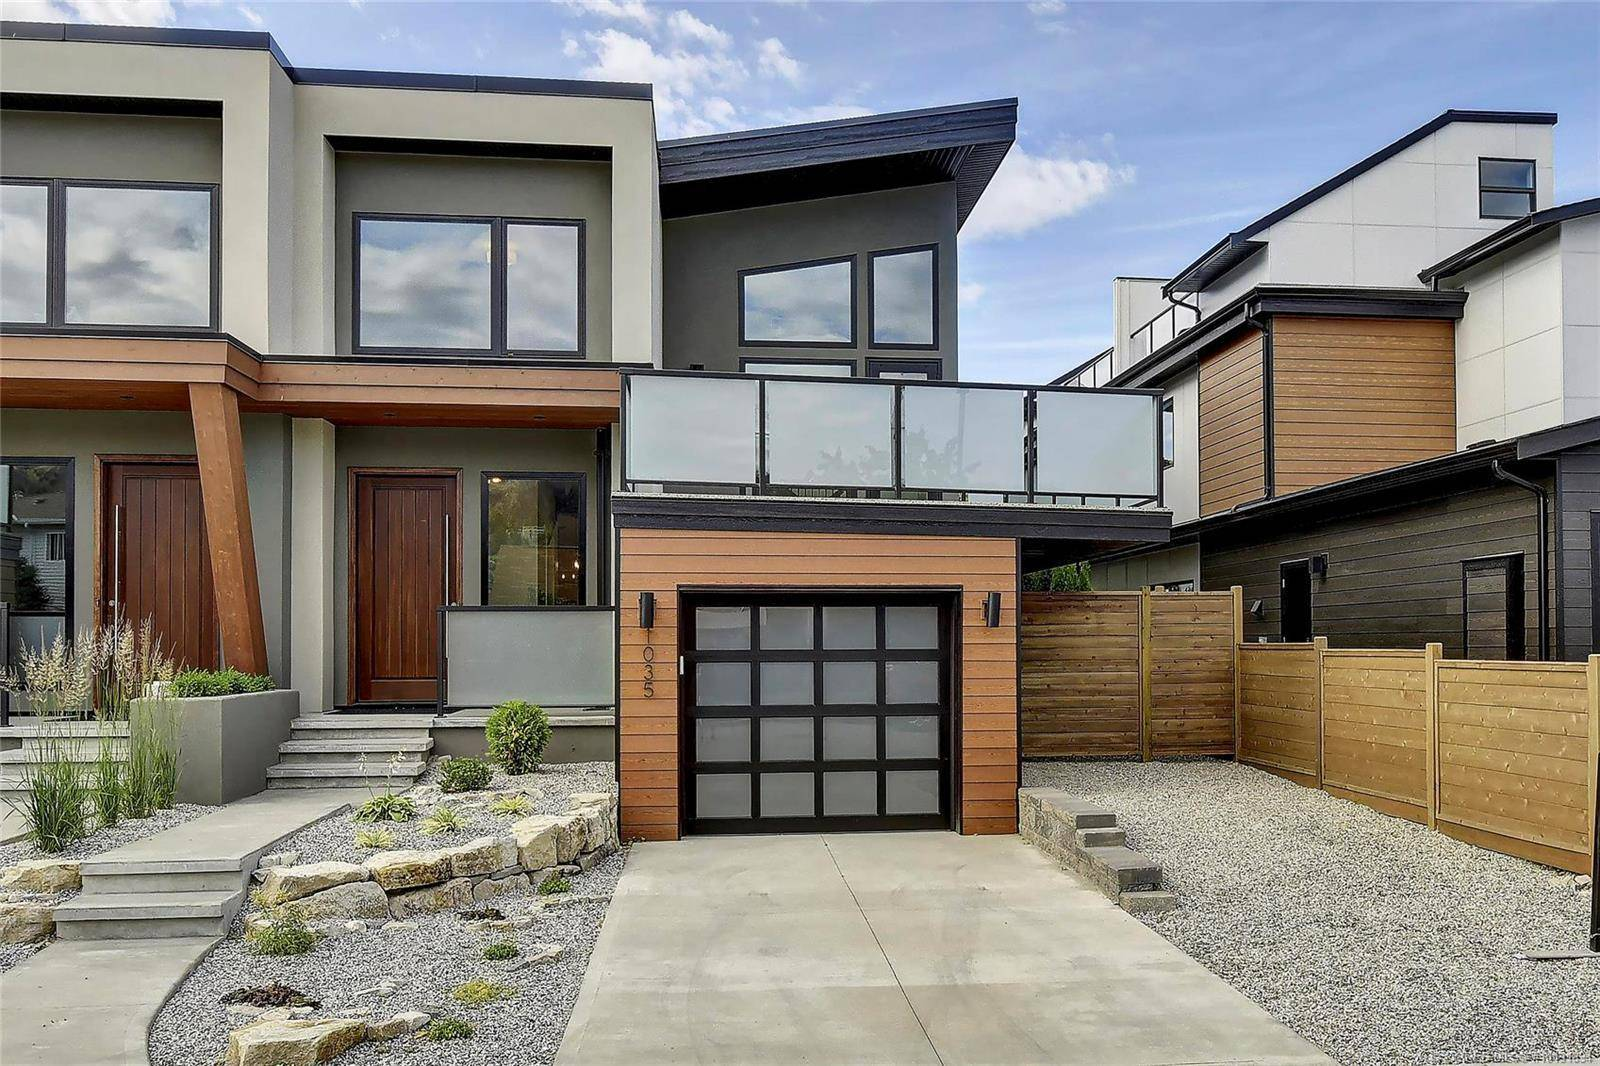 Townhouse for sale at 1035 Cawston Ave Kelowna British Columbia - MLS: 10191834